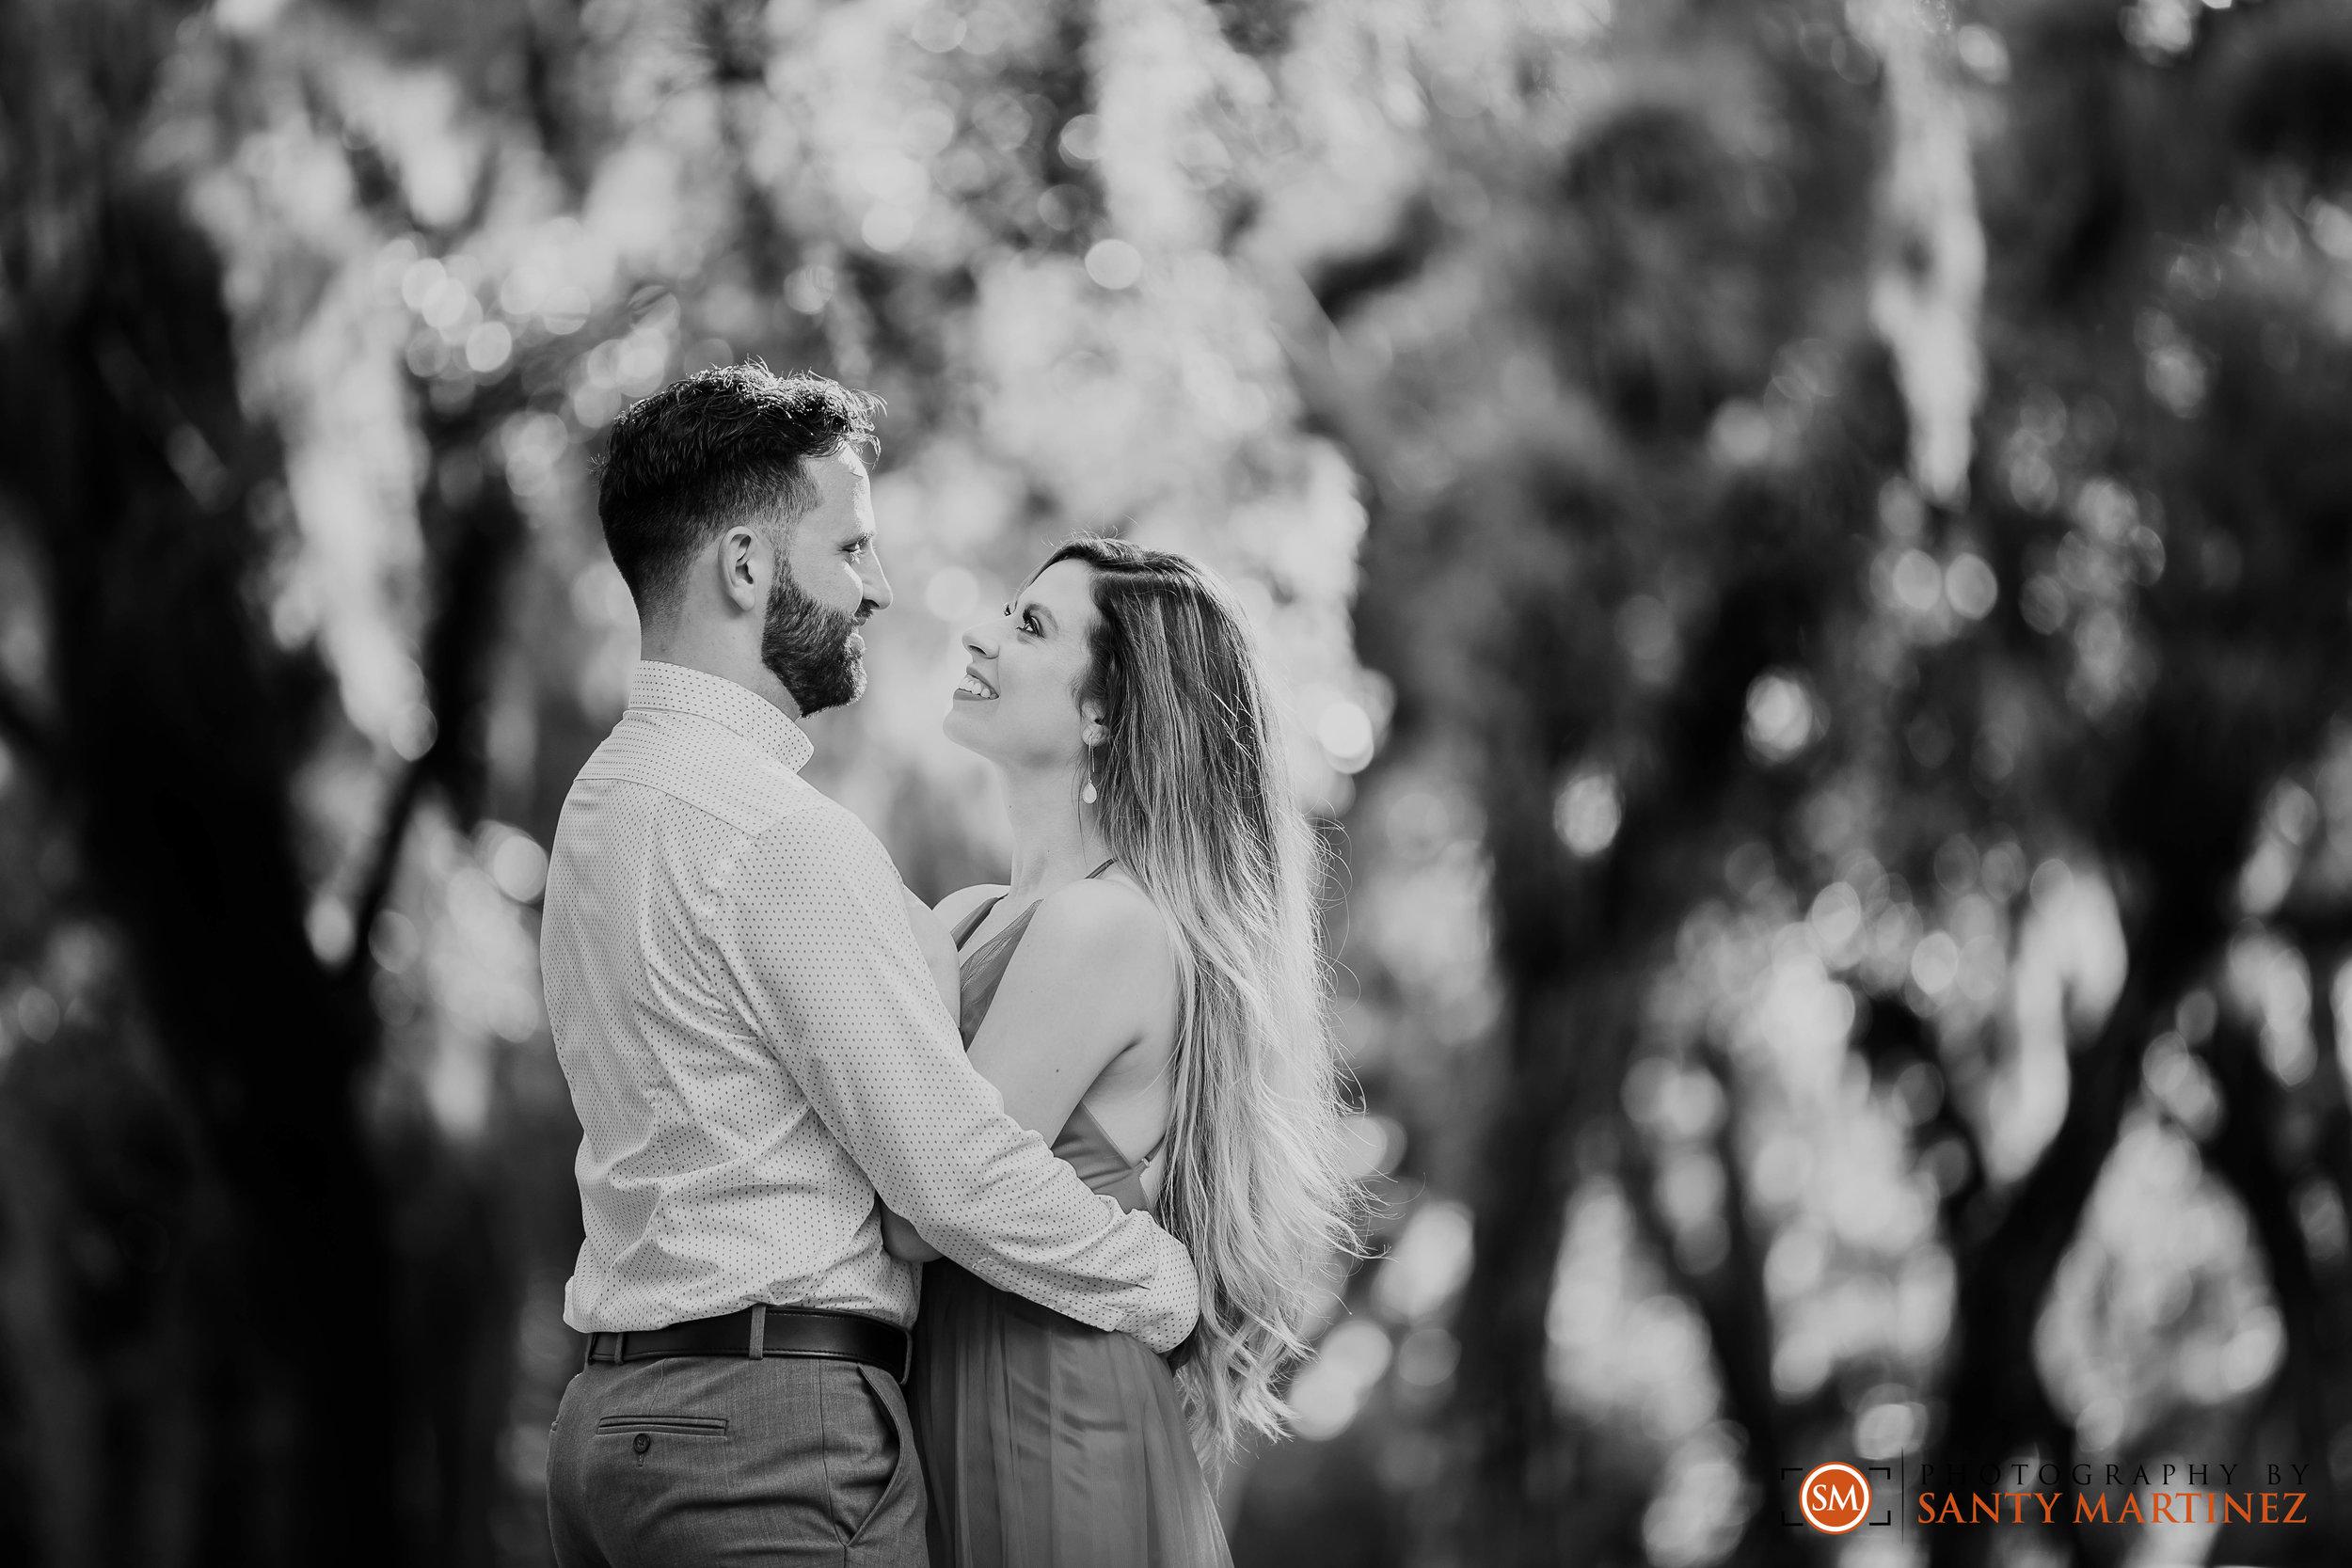 Engagement Session - Matheson Hammock Park - Santy Martinez Wedding Photographer-8.jpg